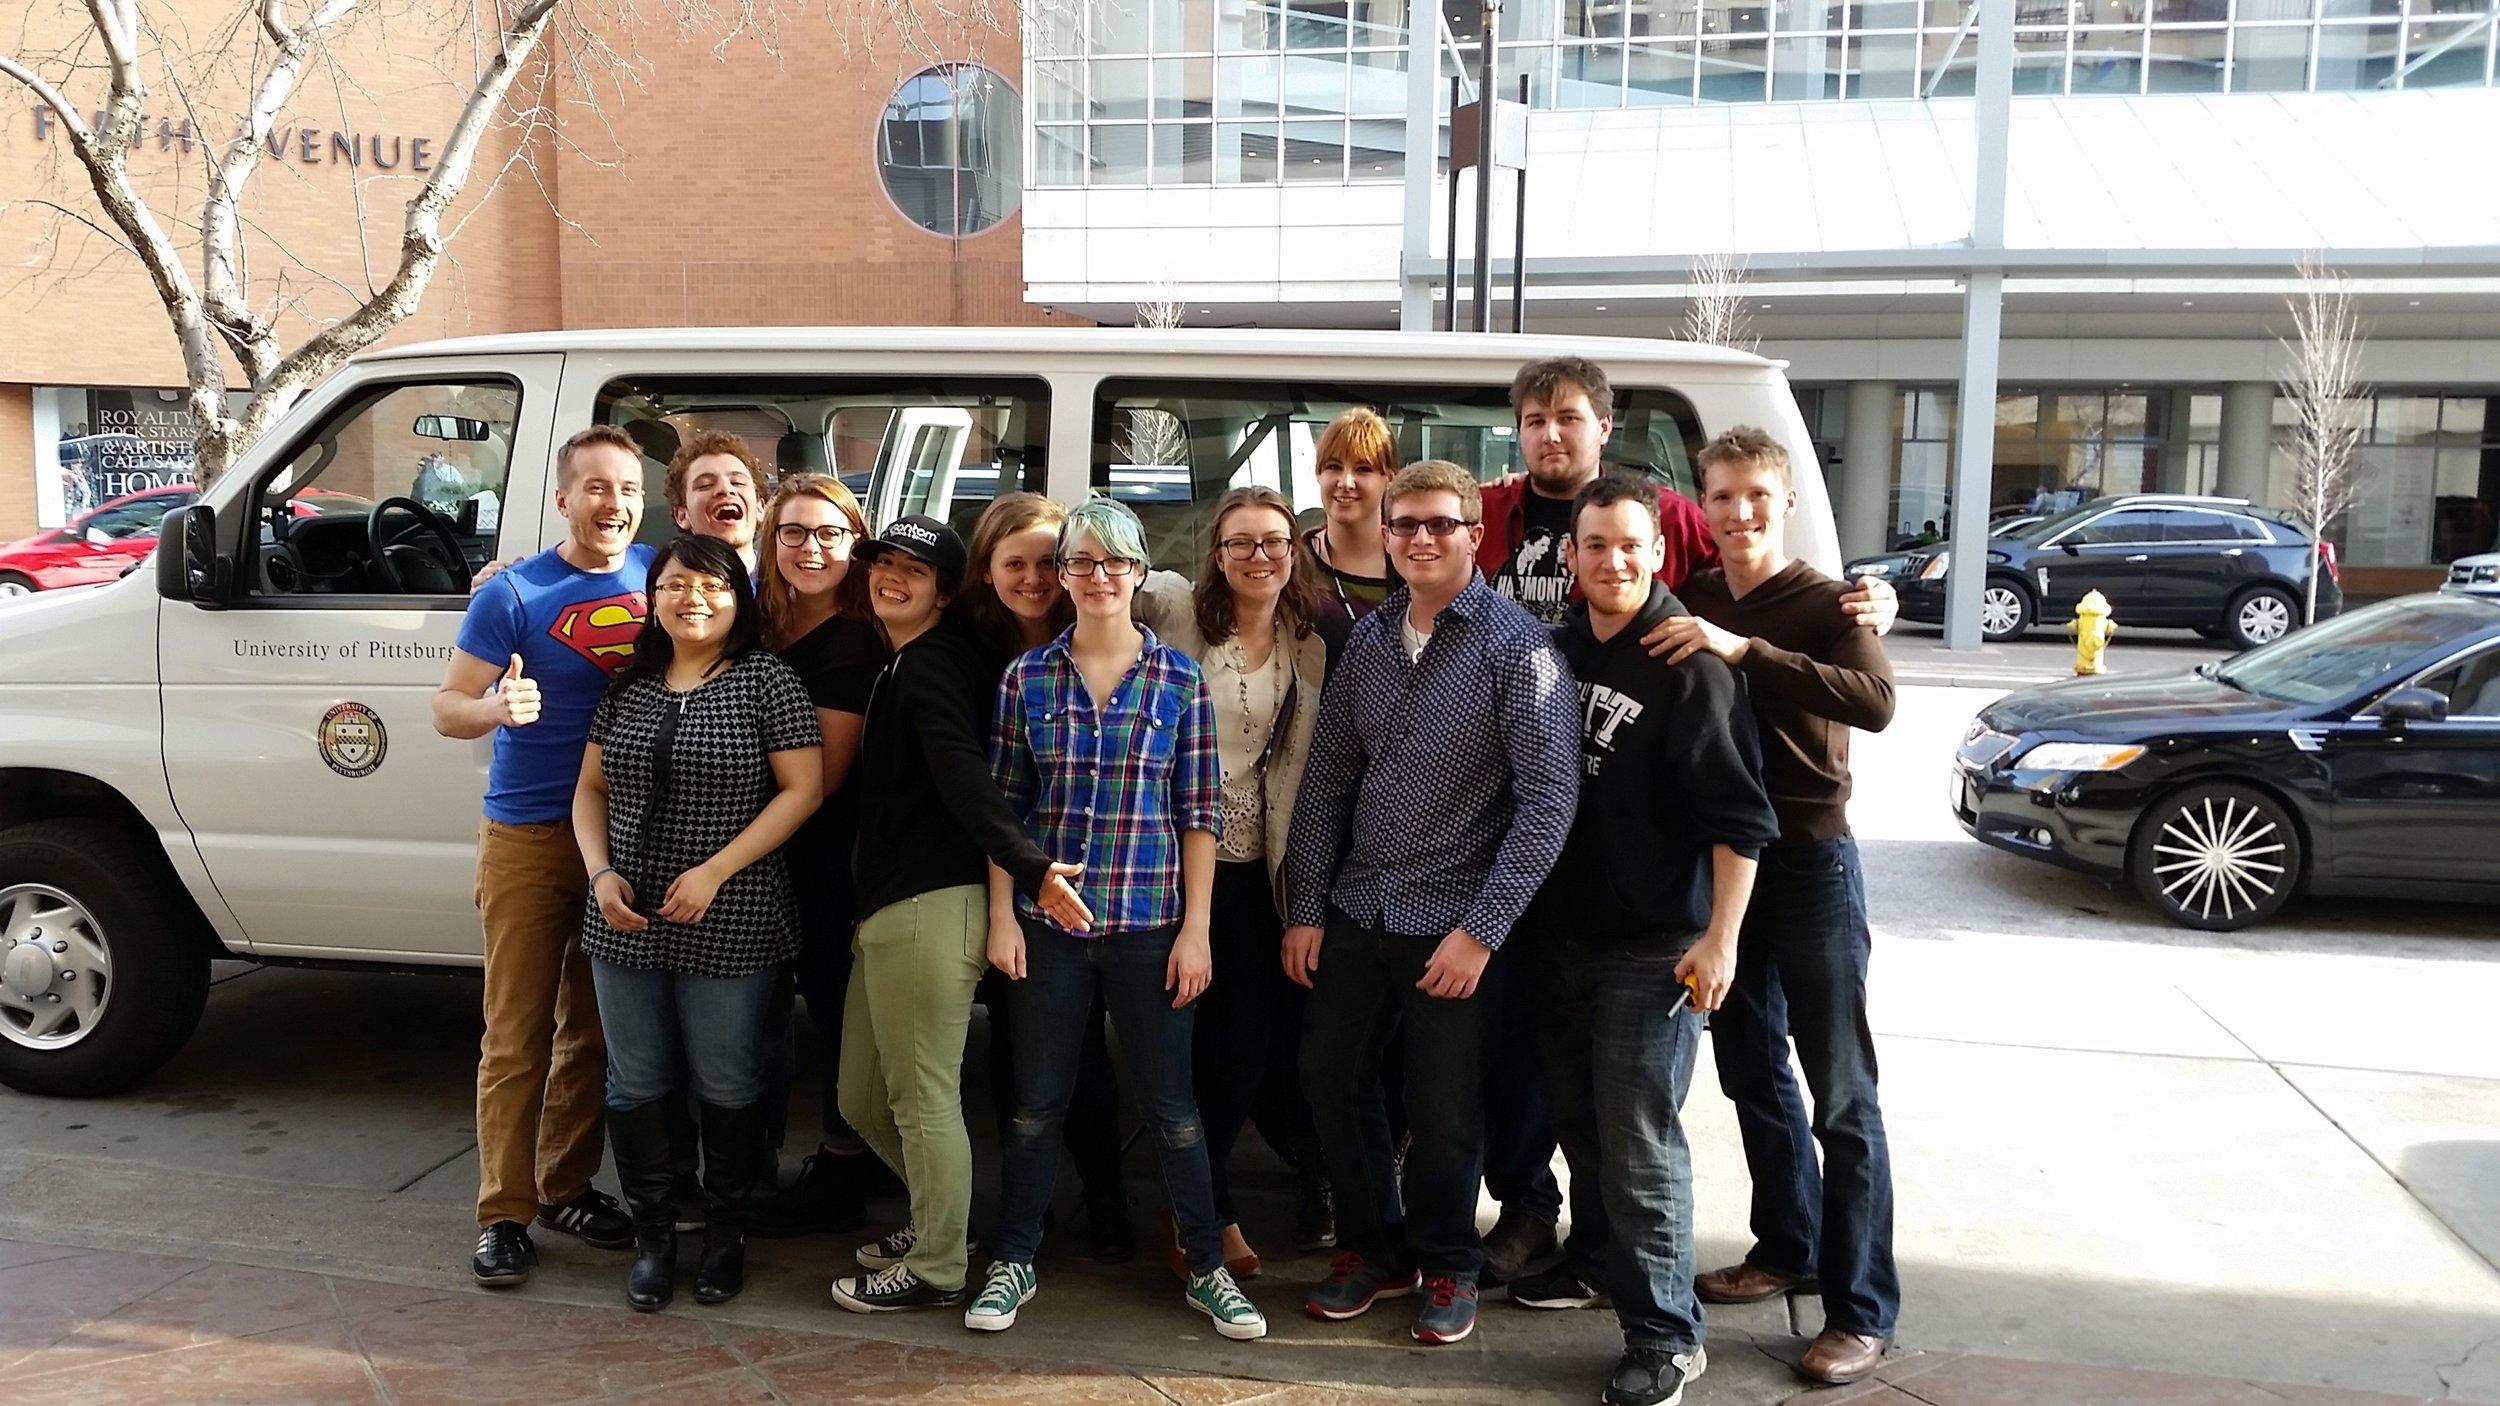 I had the pleasure of driving a van full of Pitt students to USITT 2015 Cincinnati.